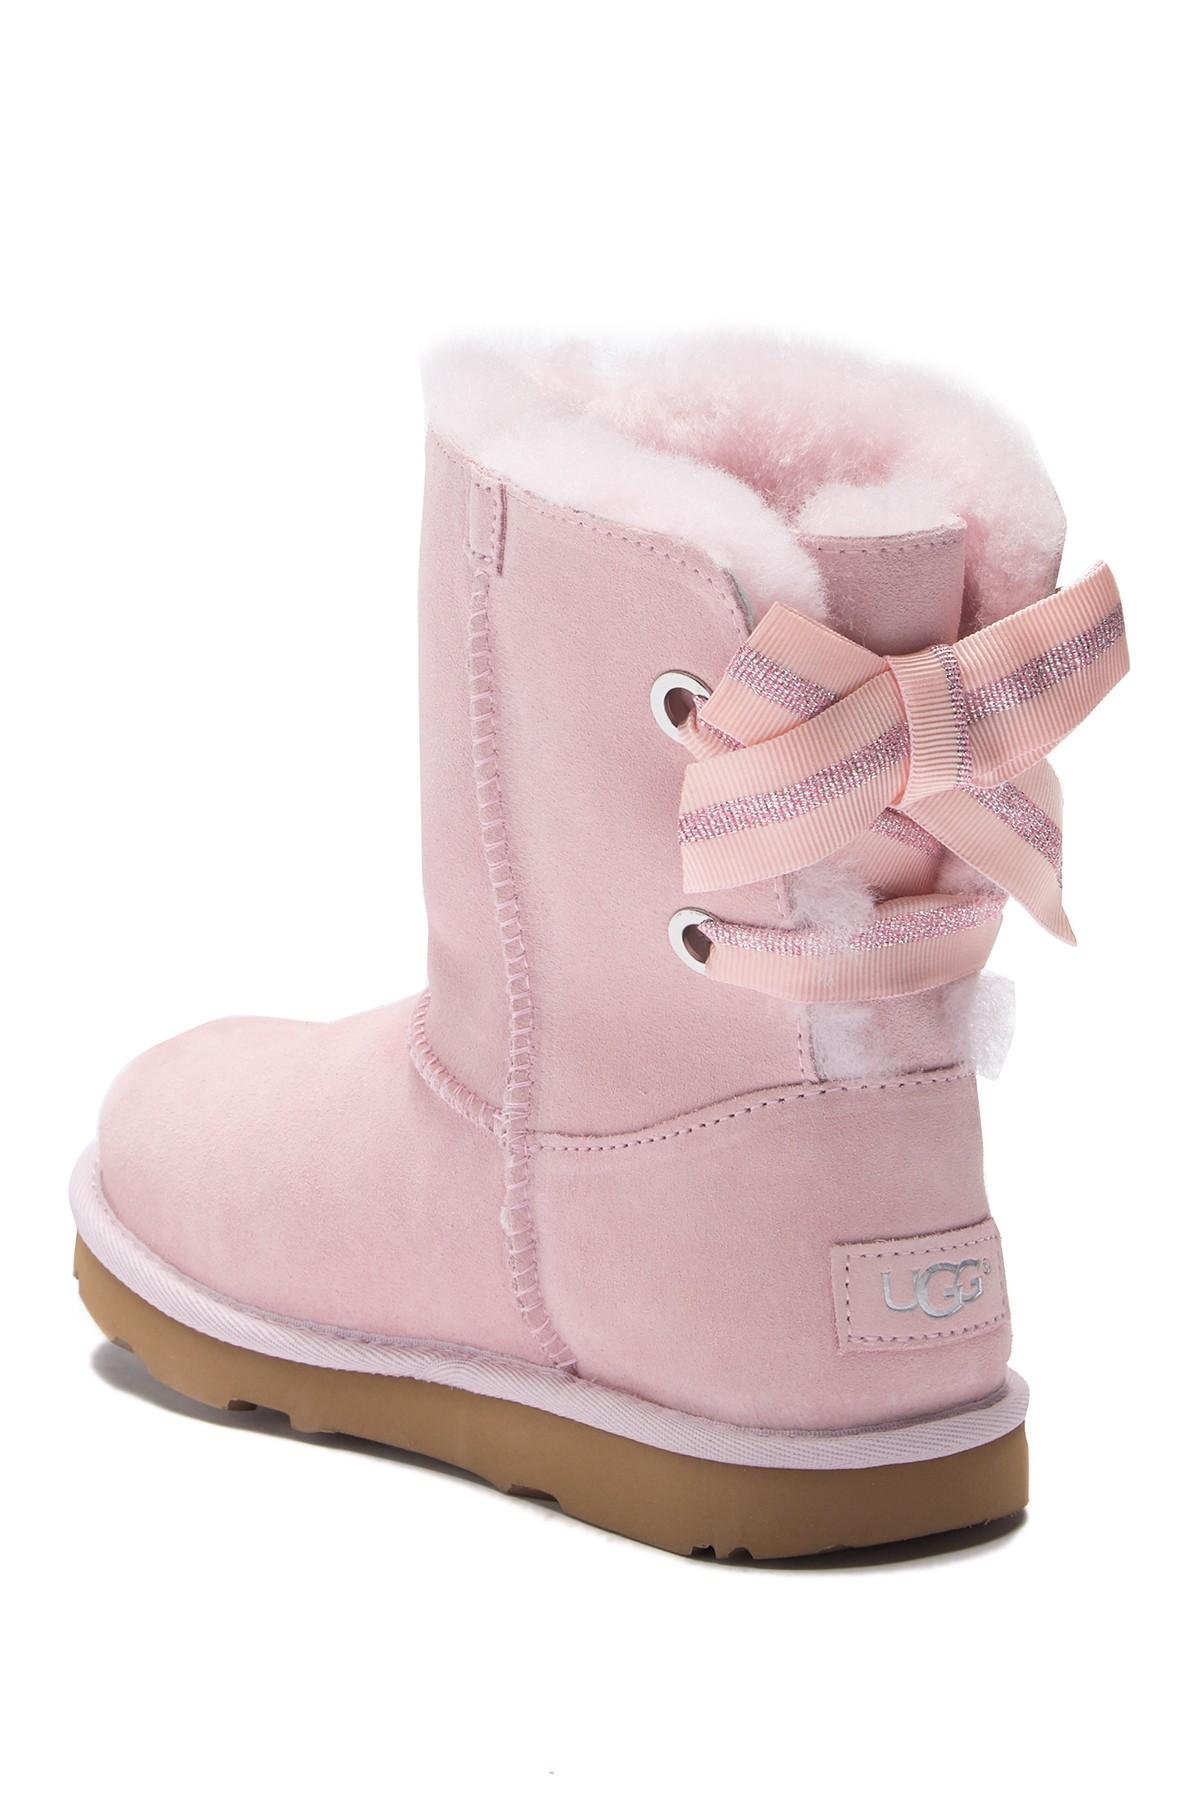 ugg boots at nordstrom rack